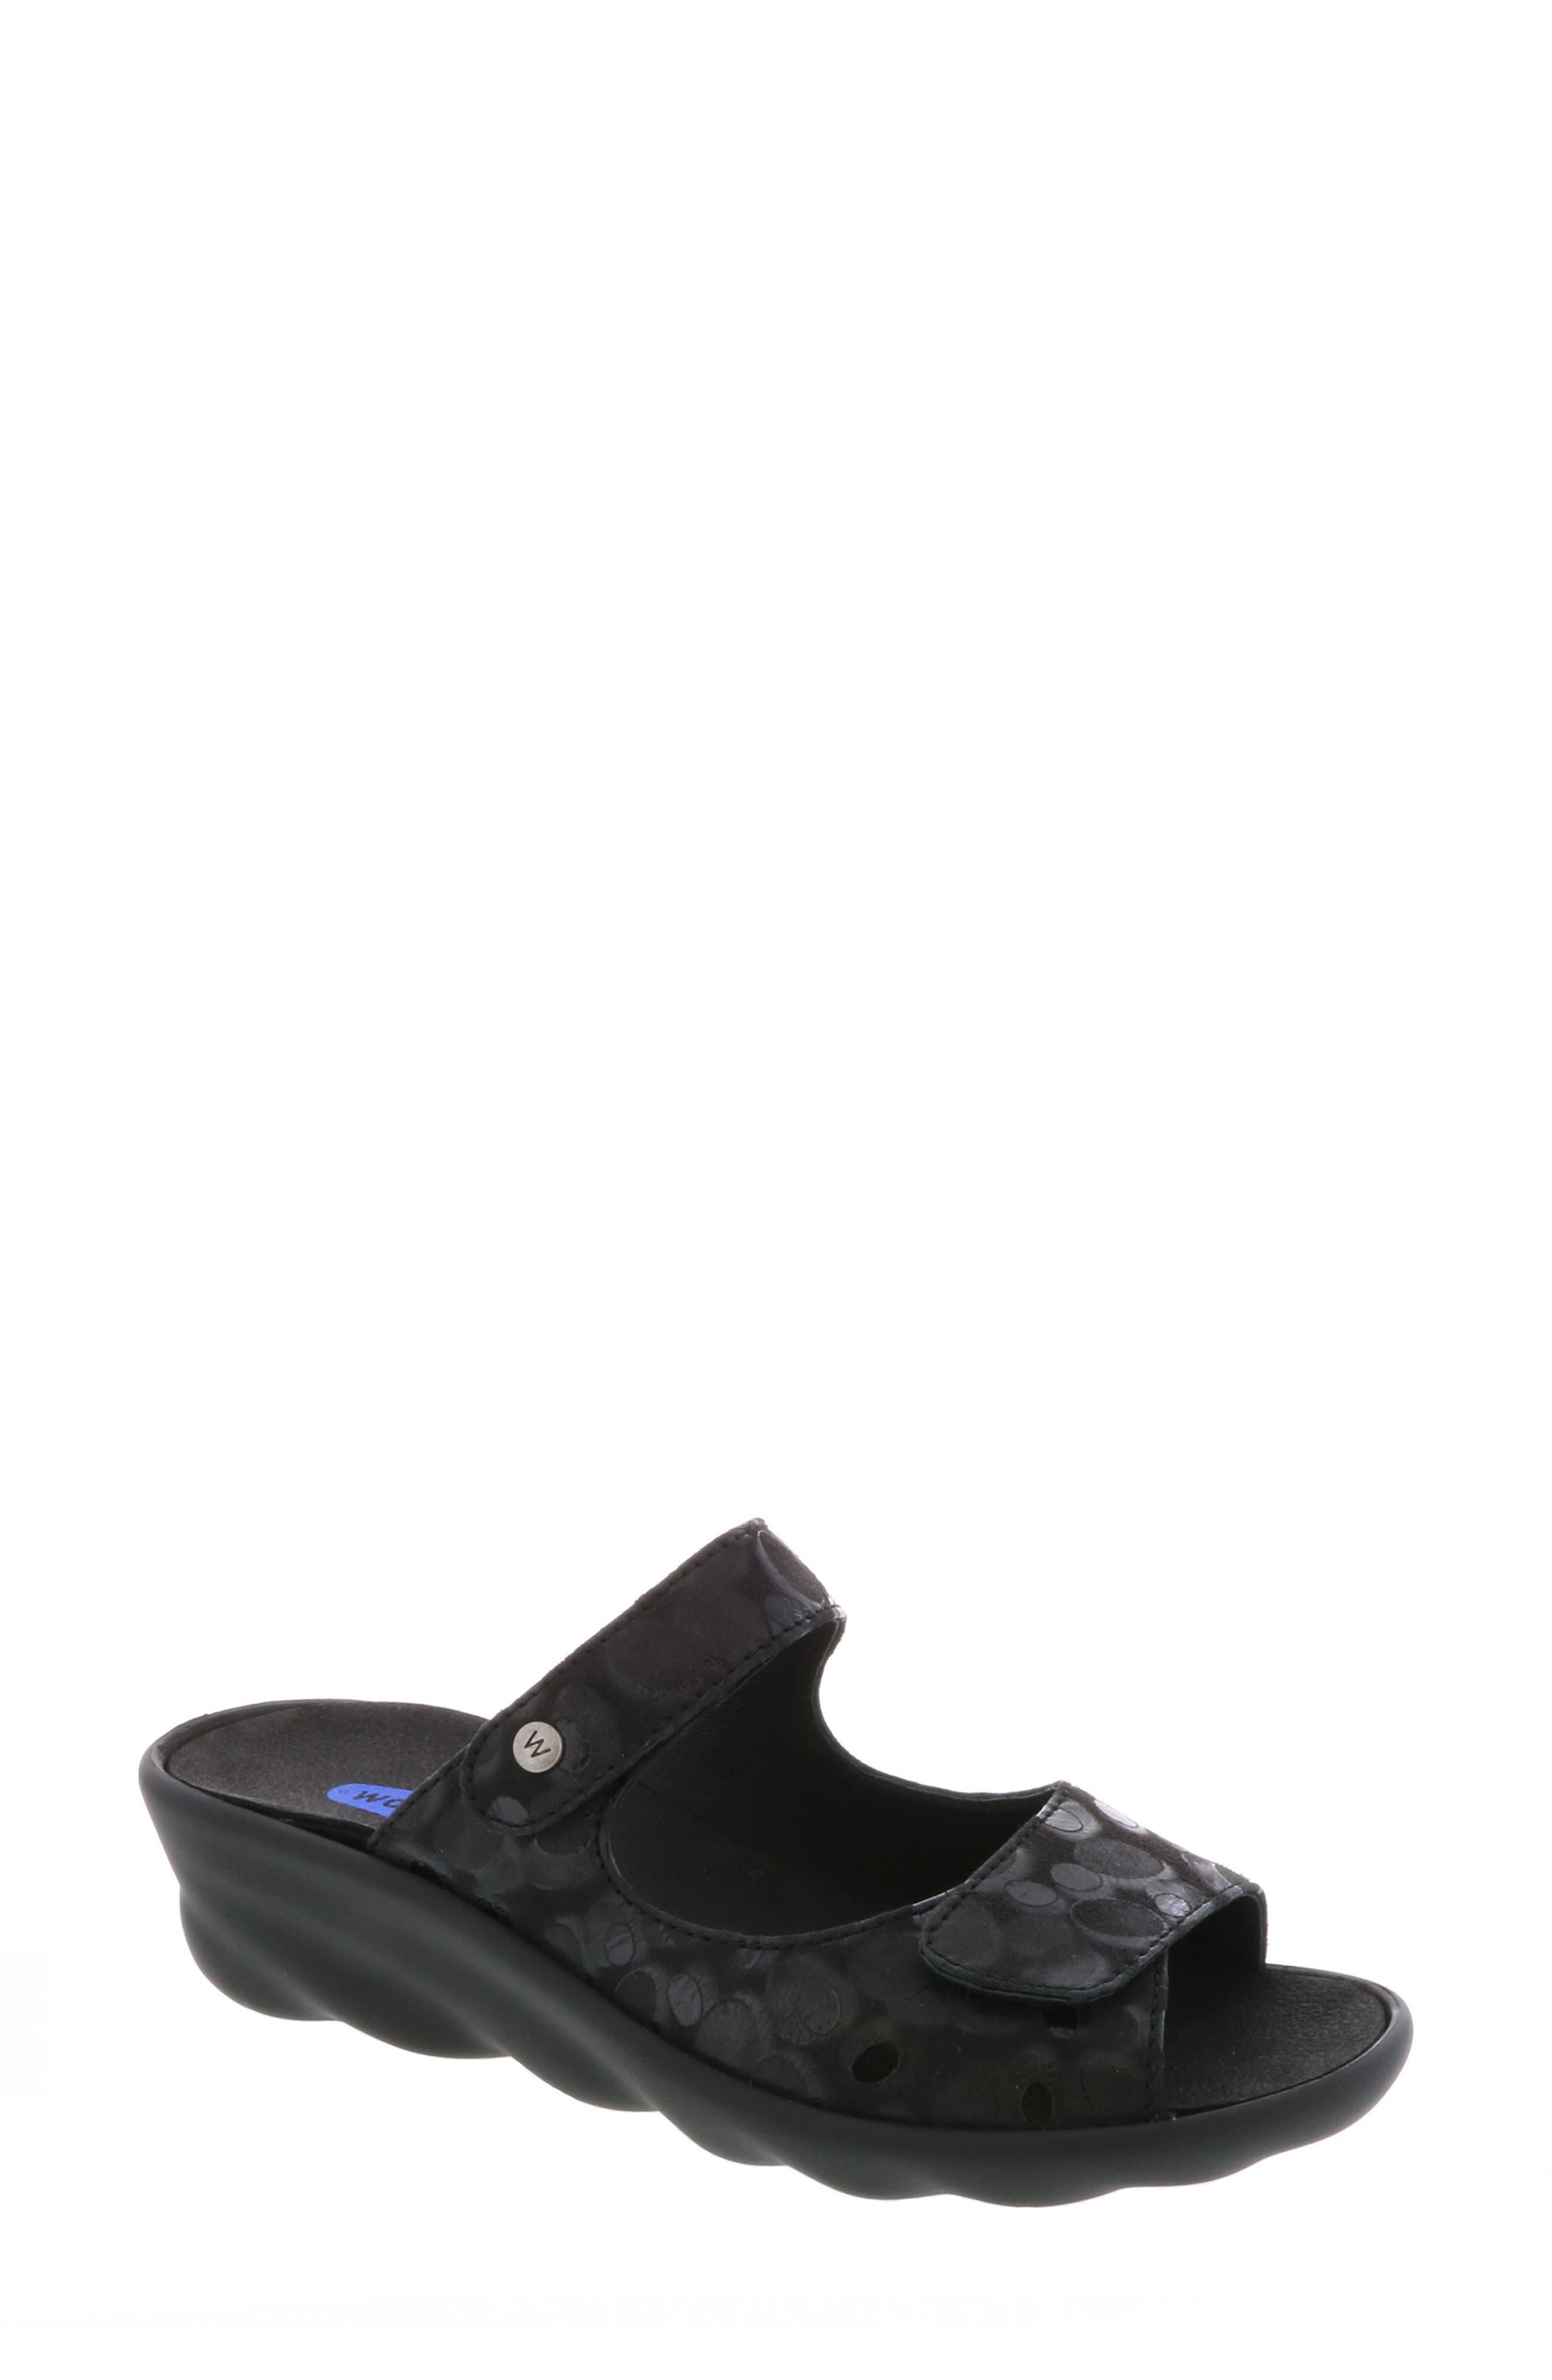 Bolena Slide Sandal,                             Main thumbnail 1, color,                             BLACK CIRCLE PRINT